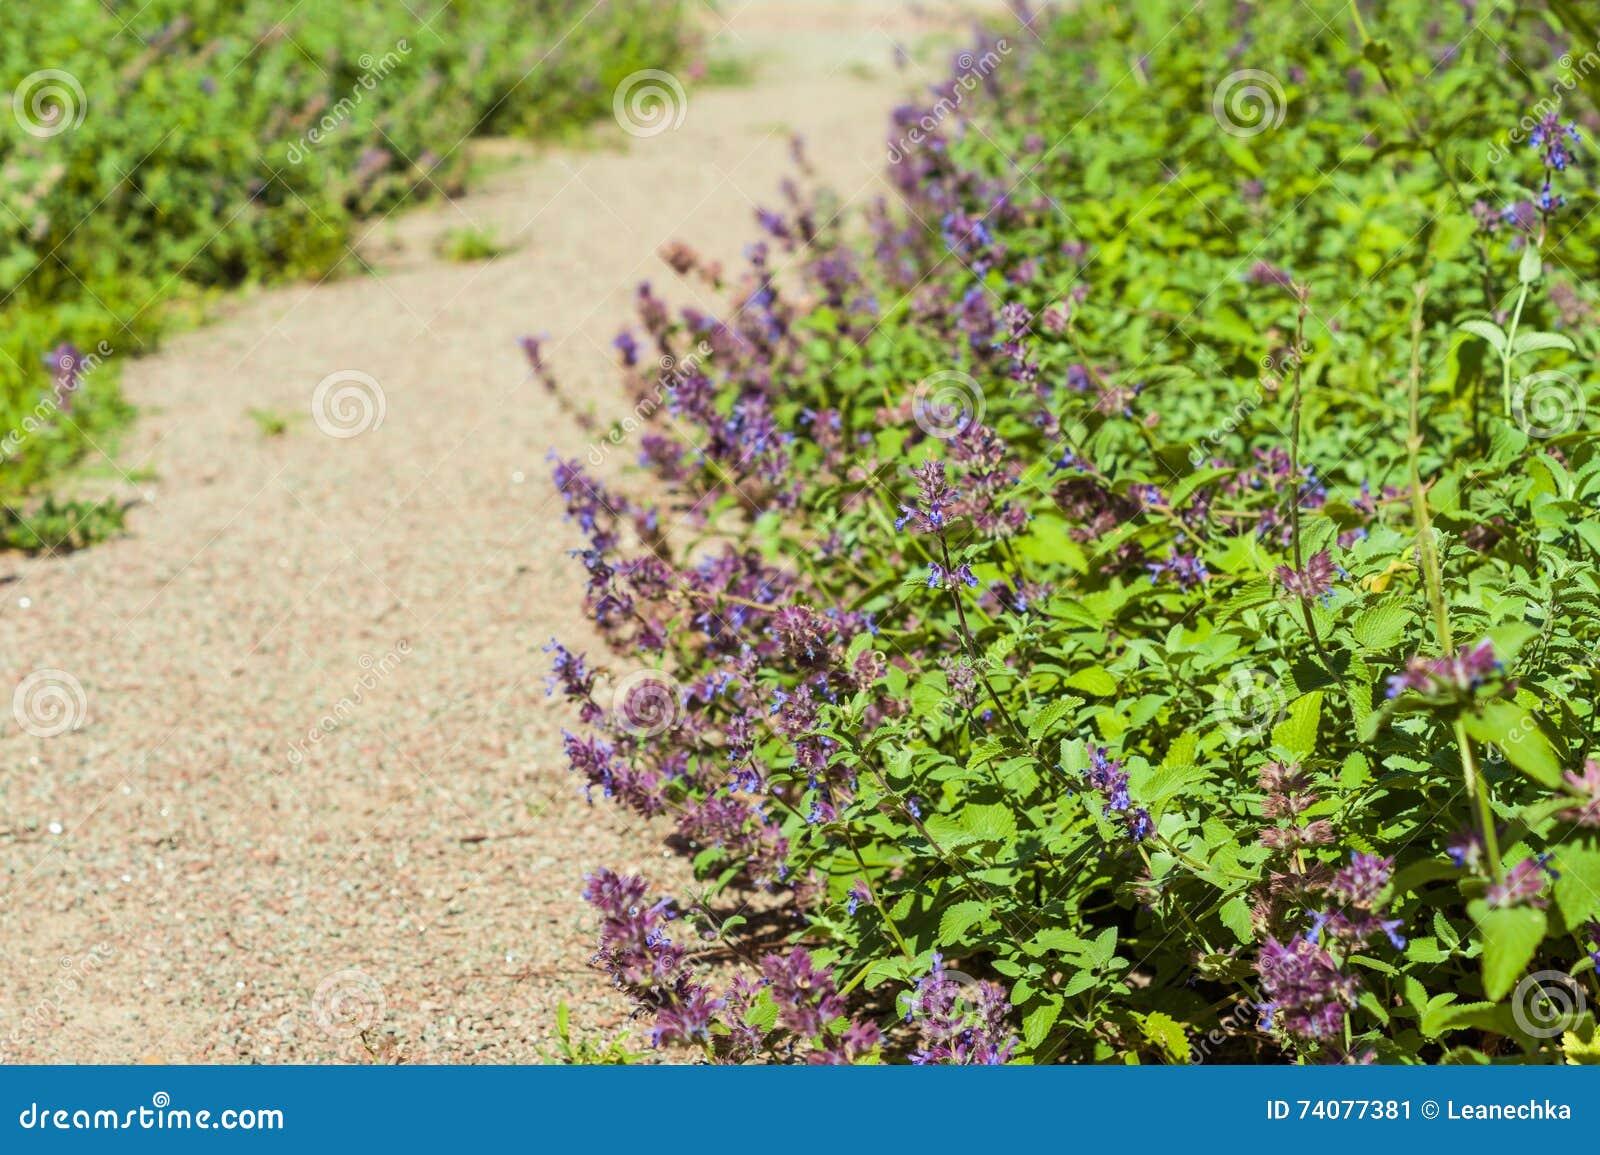 Catnip flowers (Nepeta) in country rustic garden.